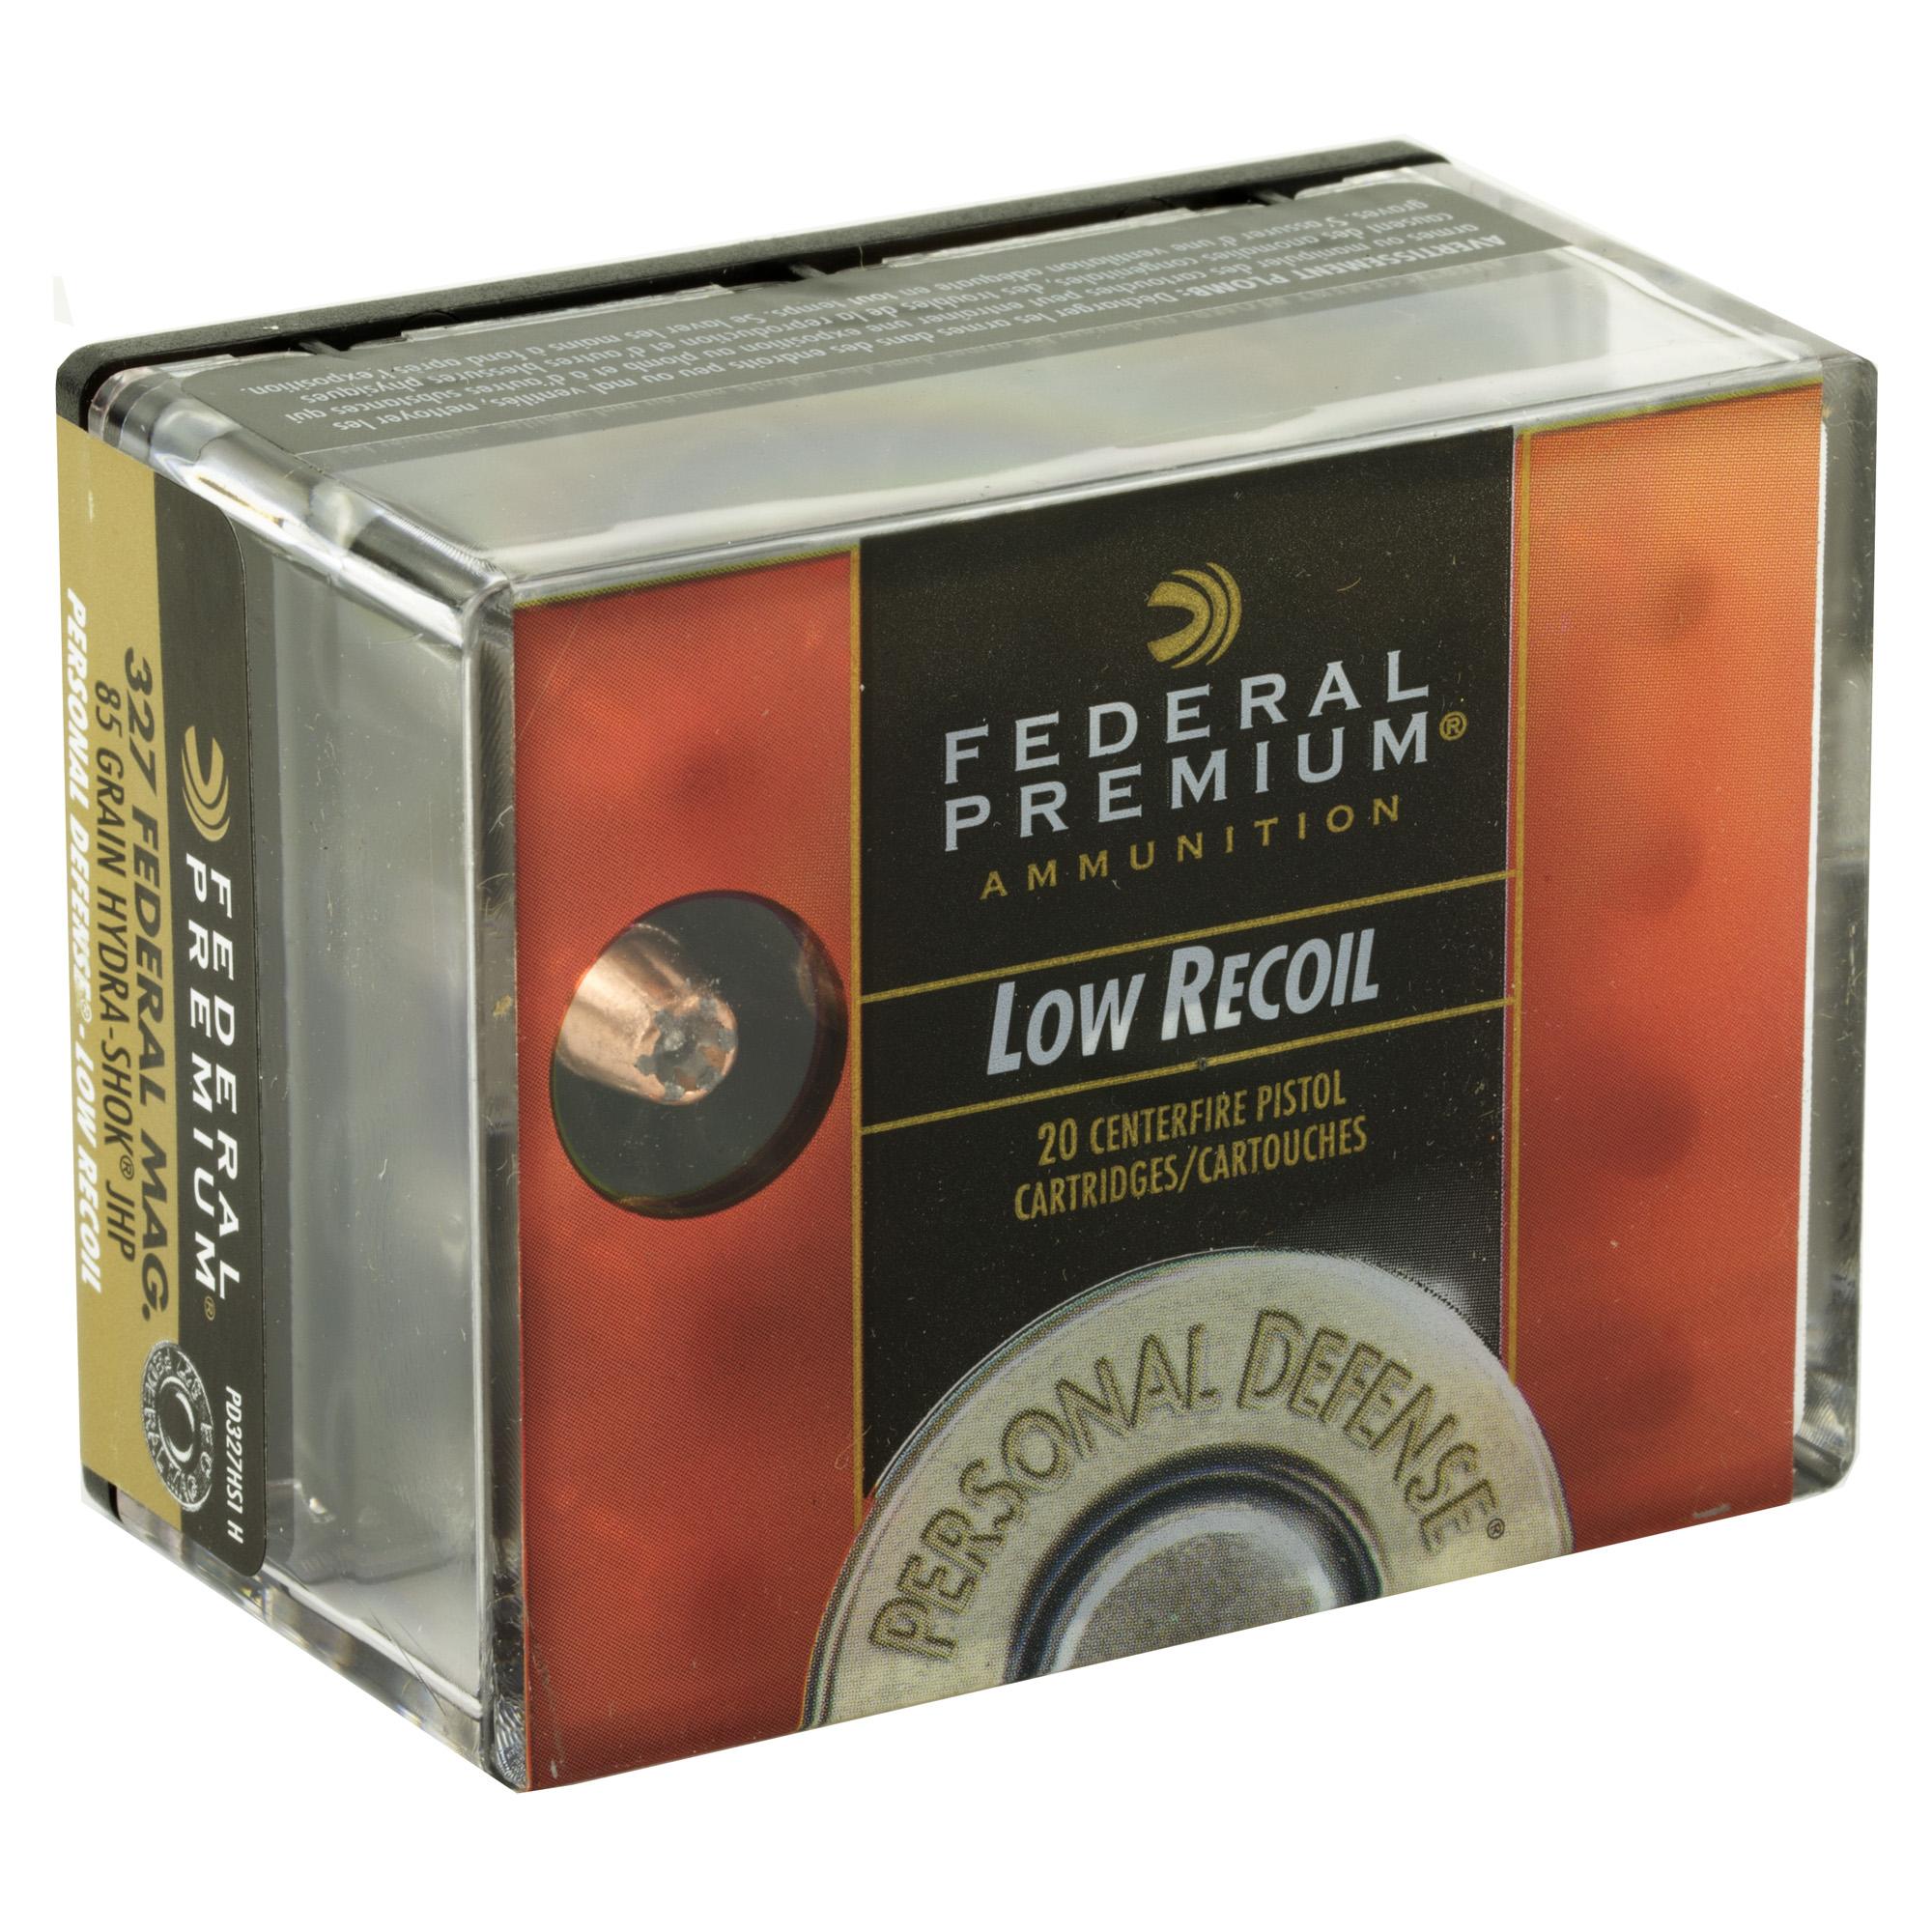 Fed Pd Hydra-shok 327fed 85gr 20/200